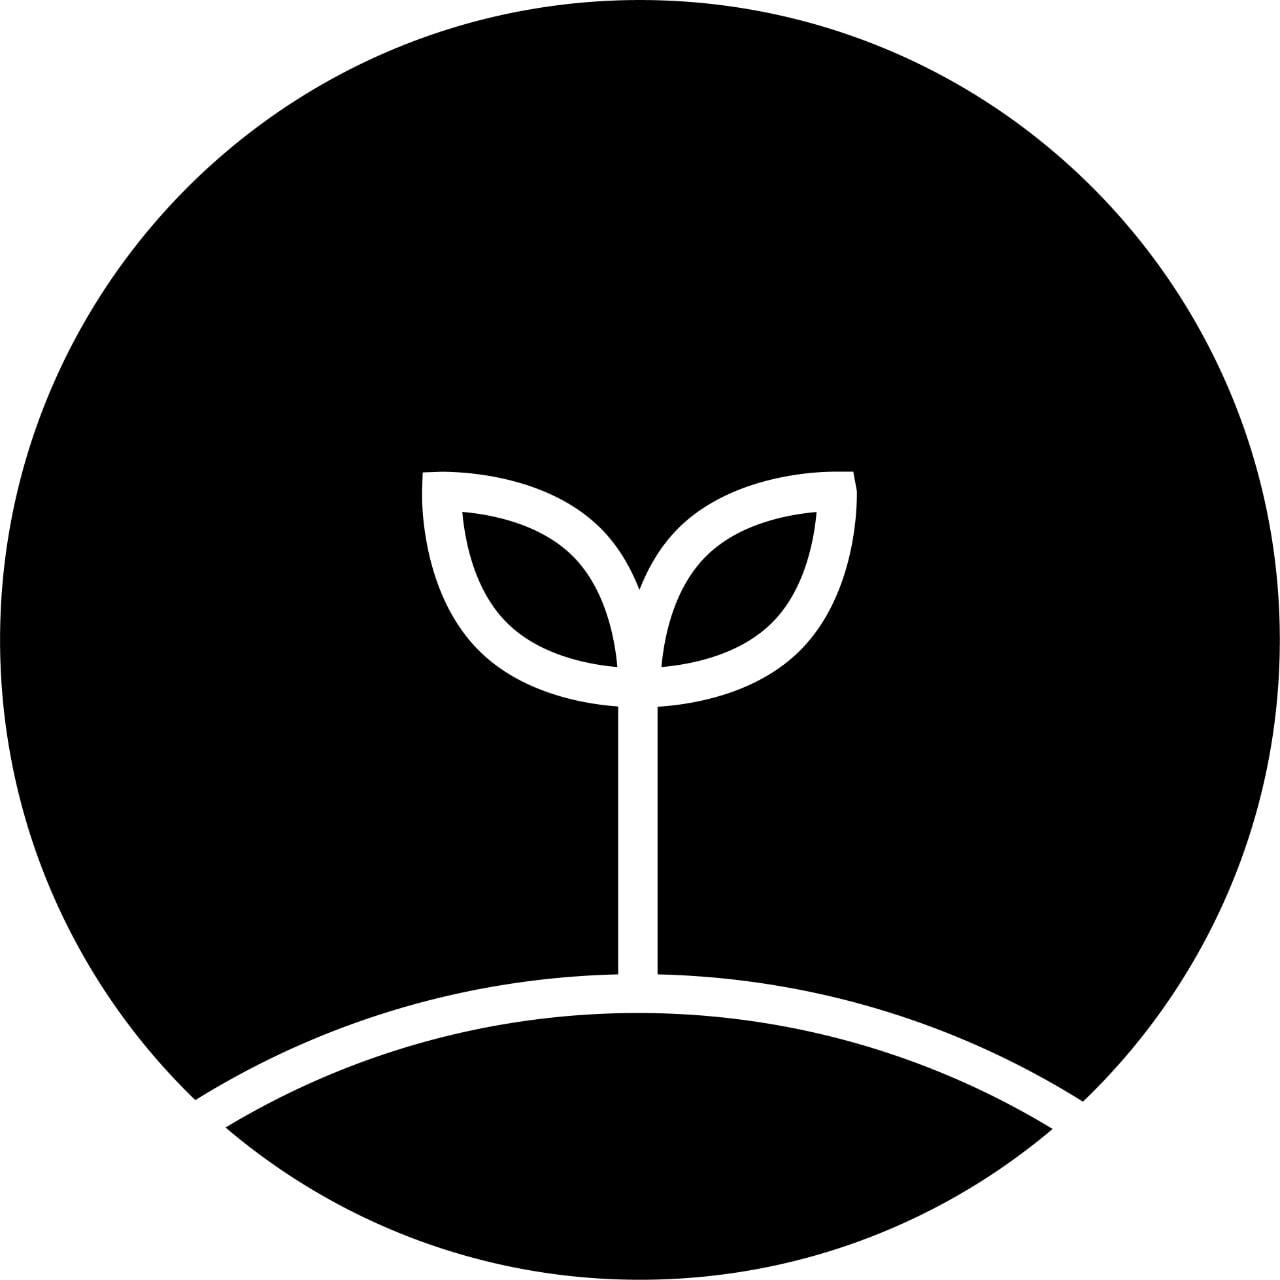 Tasselo logo